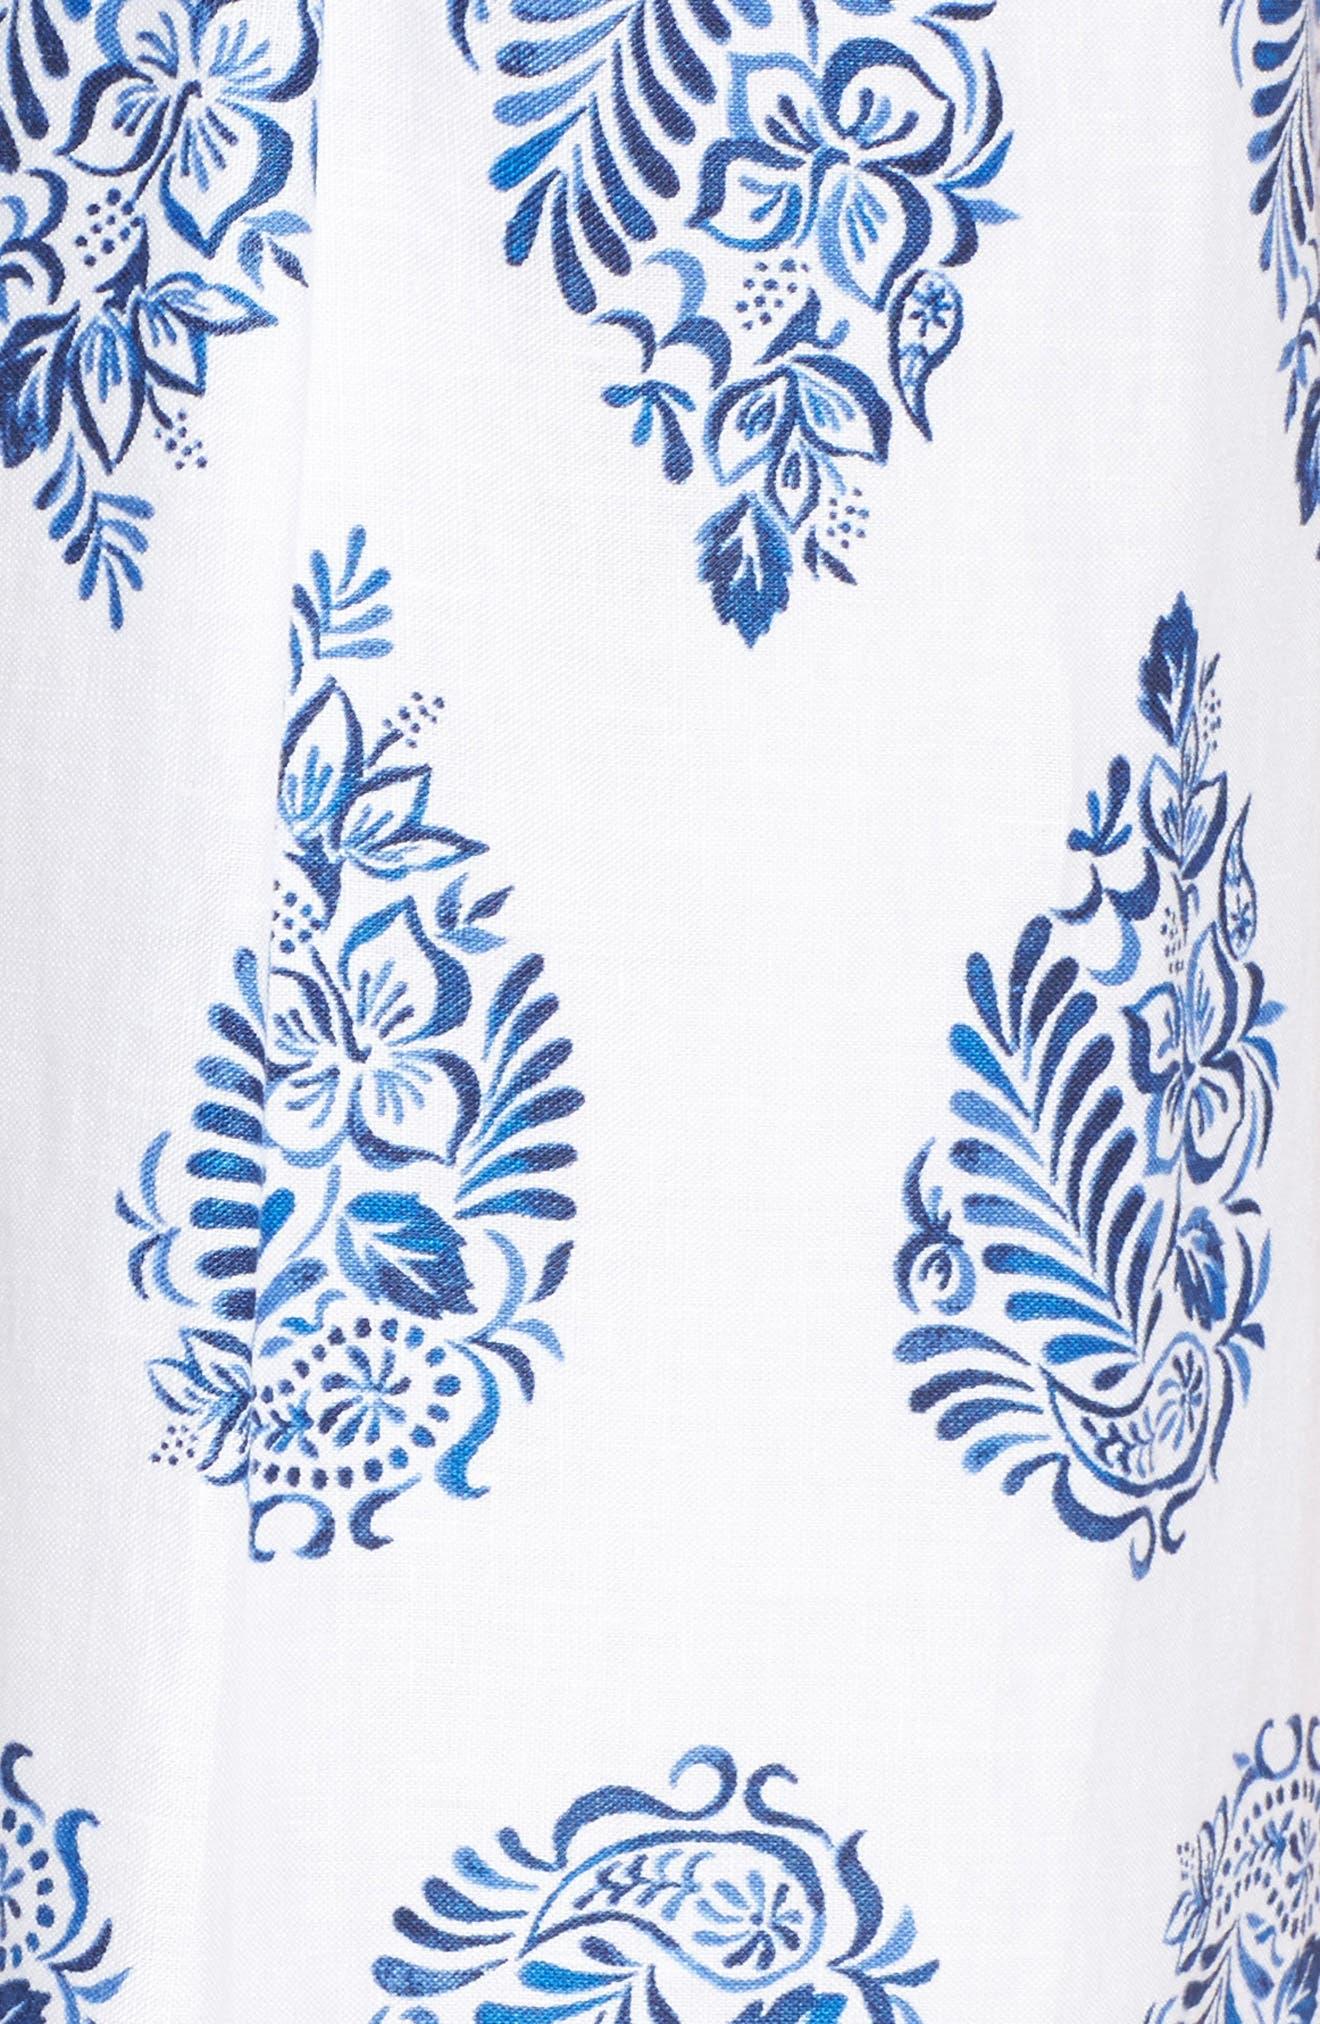 Paleys Paisley Sleeveless Shift Dress,                             Alternate thumbnail 5, color,                             Cobalt